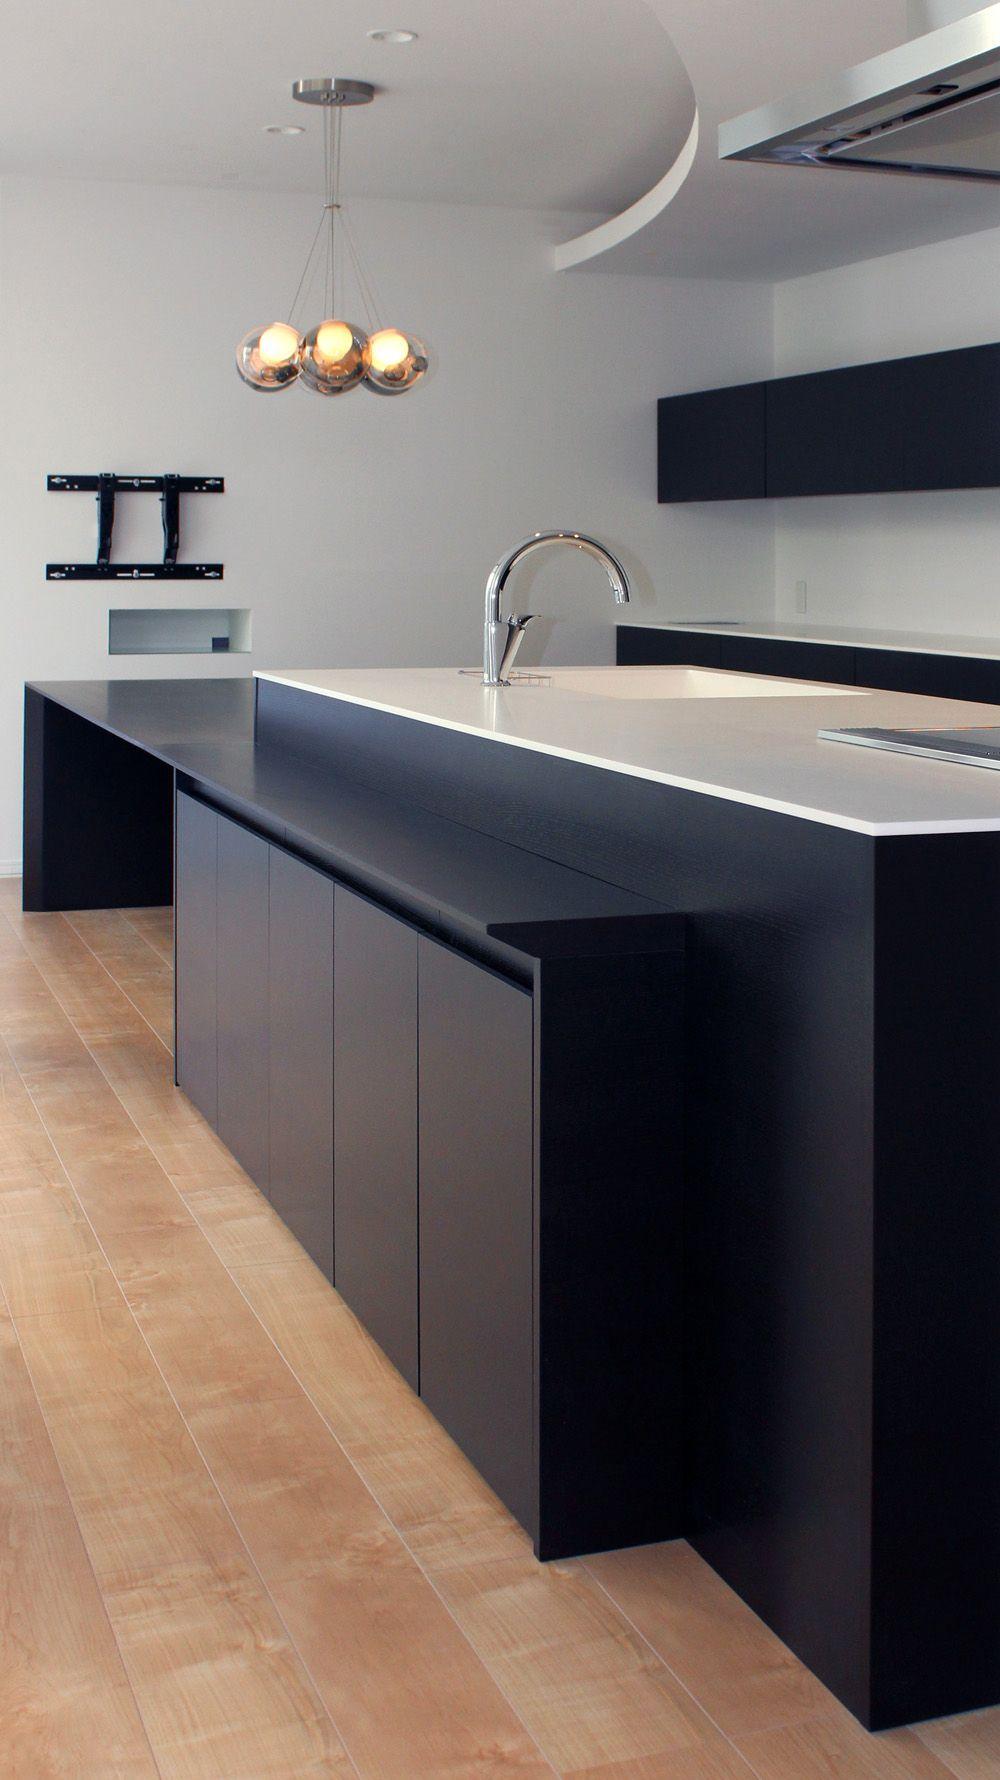 B Z Design Home Part - 36: Http://www.takken.bz/design Http://www